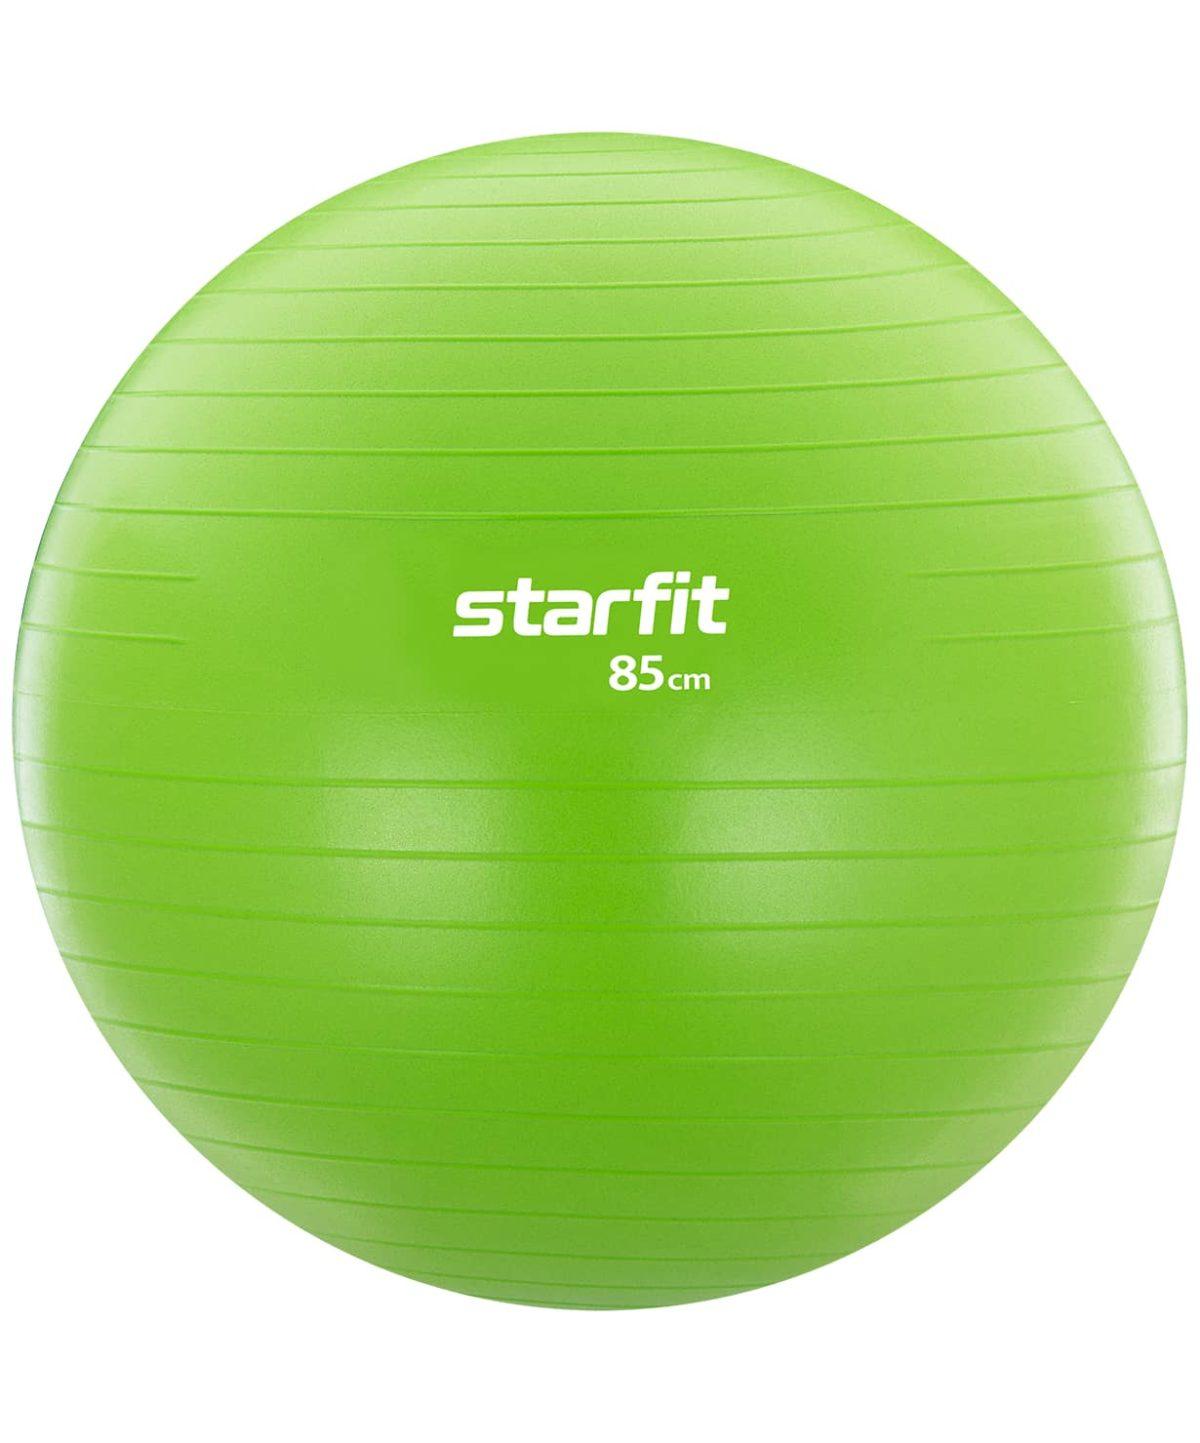 STARFIT Фитбол антивзрыв 85 см 1500 гр, без насоса GB-104: зелёный - 1